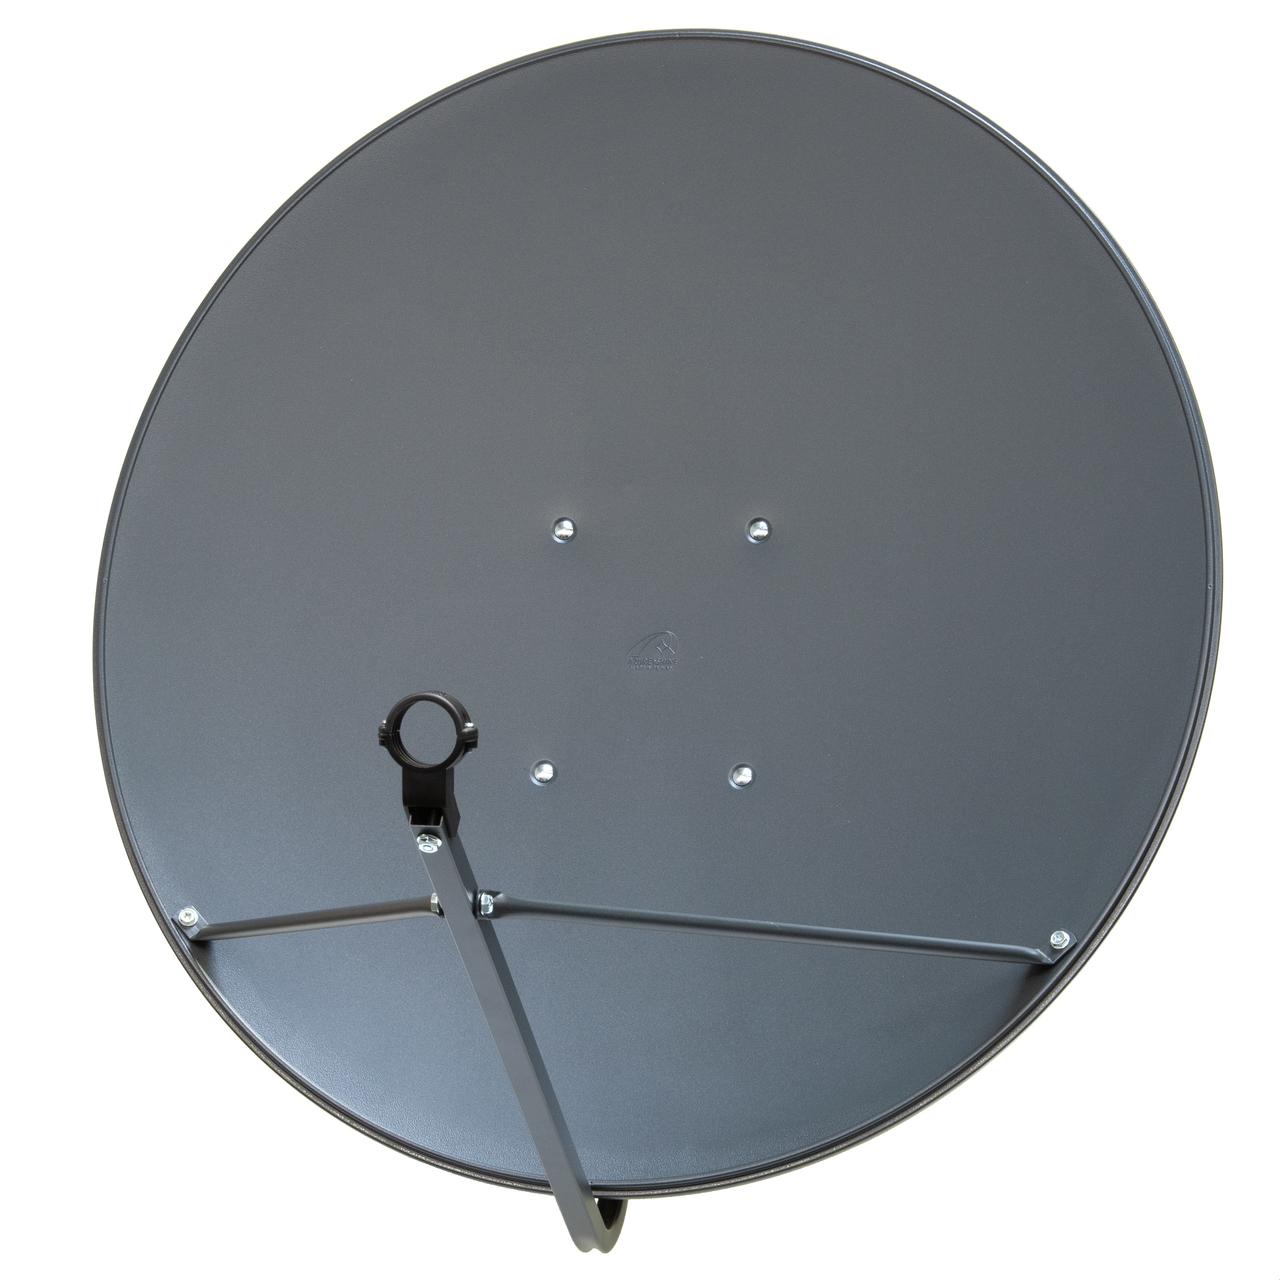 36 inch 90 cm free to air fta satellite dish hd lnbf ebay. Black Bedroom Furniture Sets. Home Design Ideas